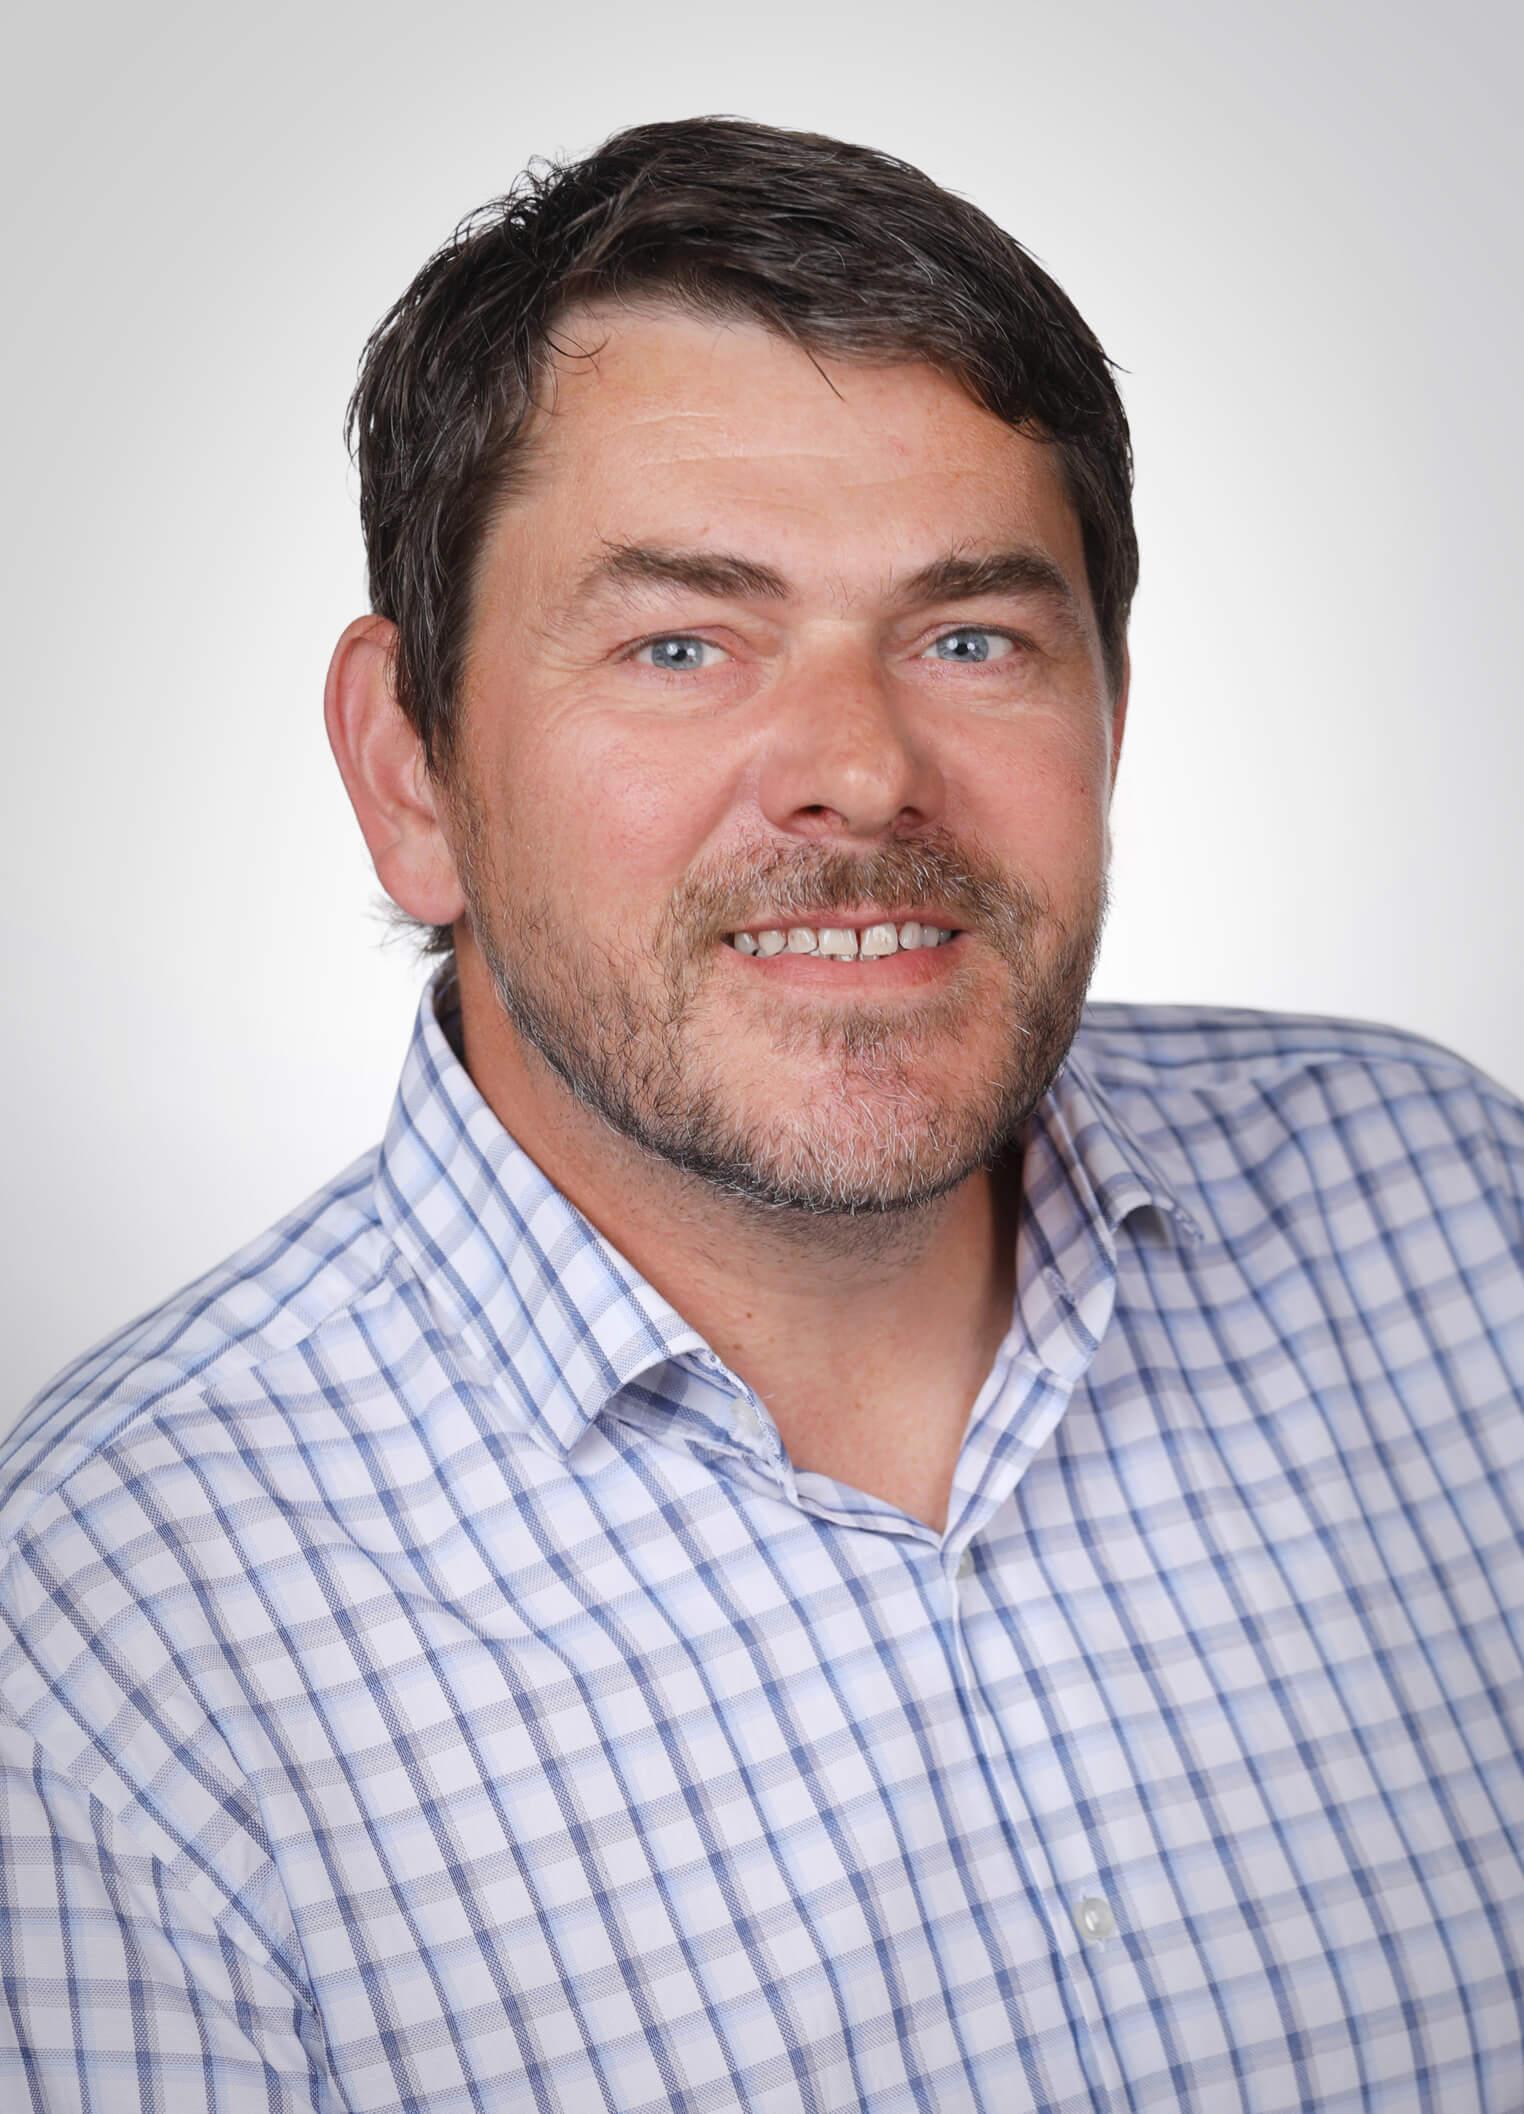 André Müller<br><br>Projektleitung,<br> Staatl. geprüfter<br>Techniker Fachrichtung <br>Heizungs-, Lüftungs-,<br> und Klimatechnik